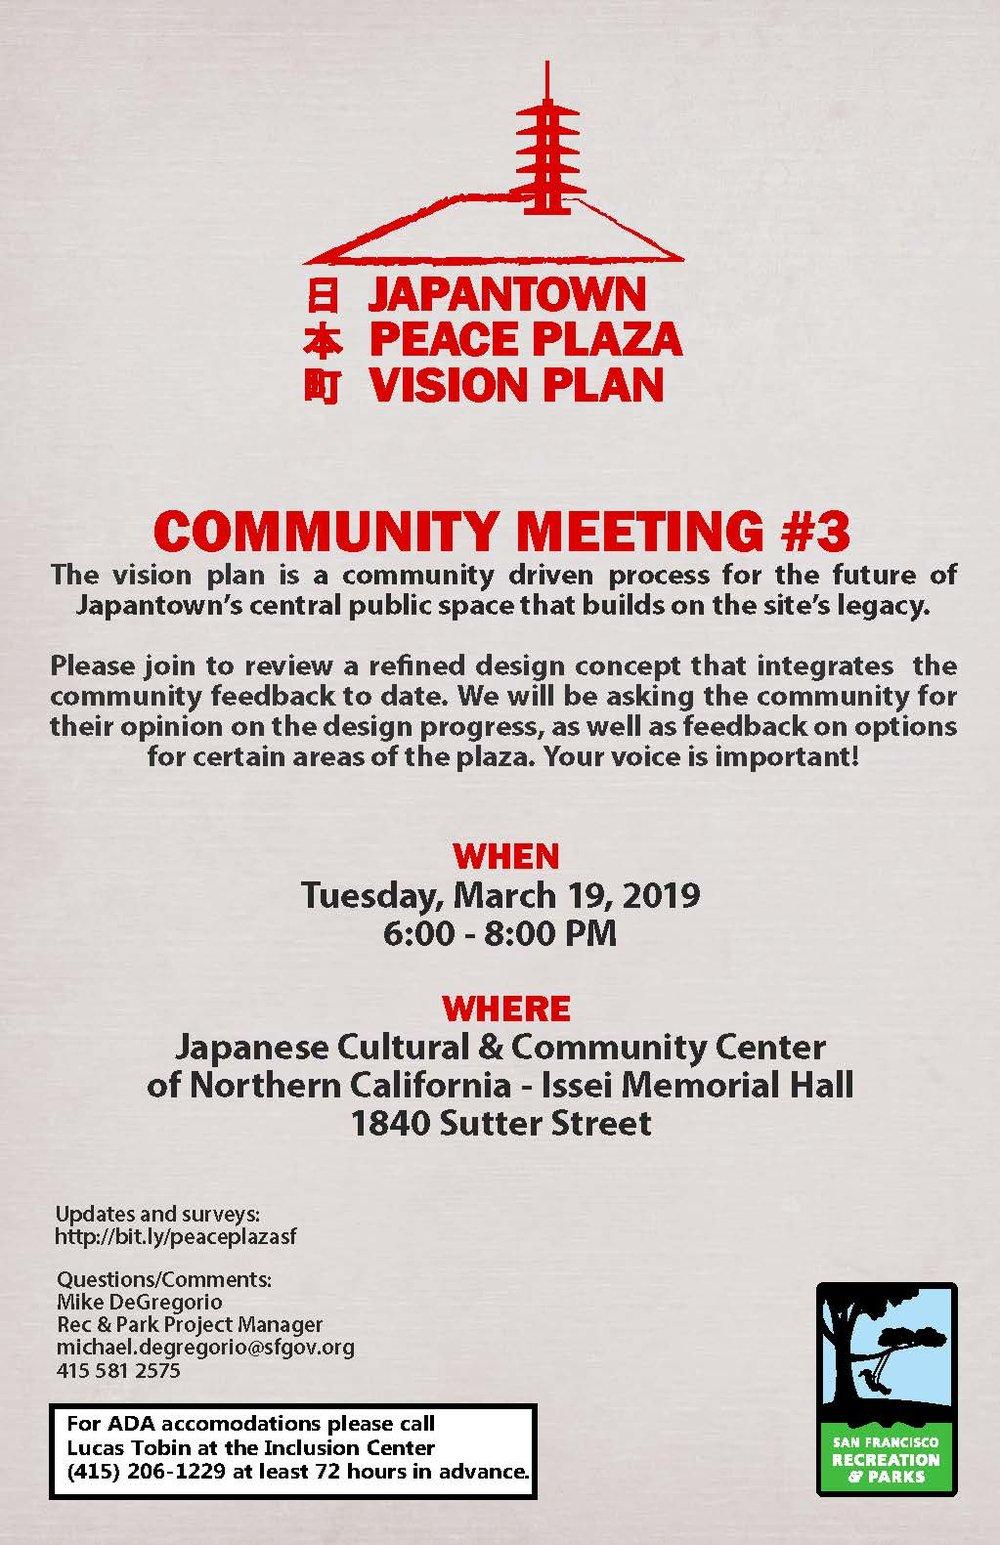 peaceplaza_mtg3_poster.jpg